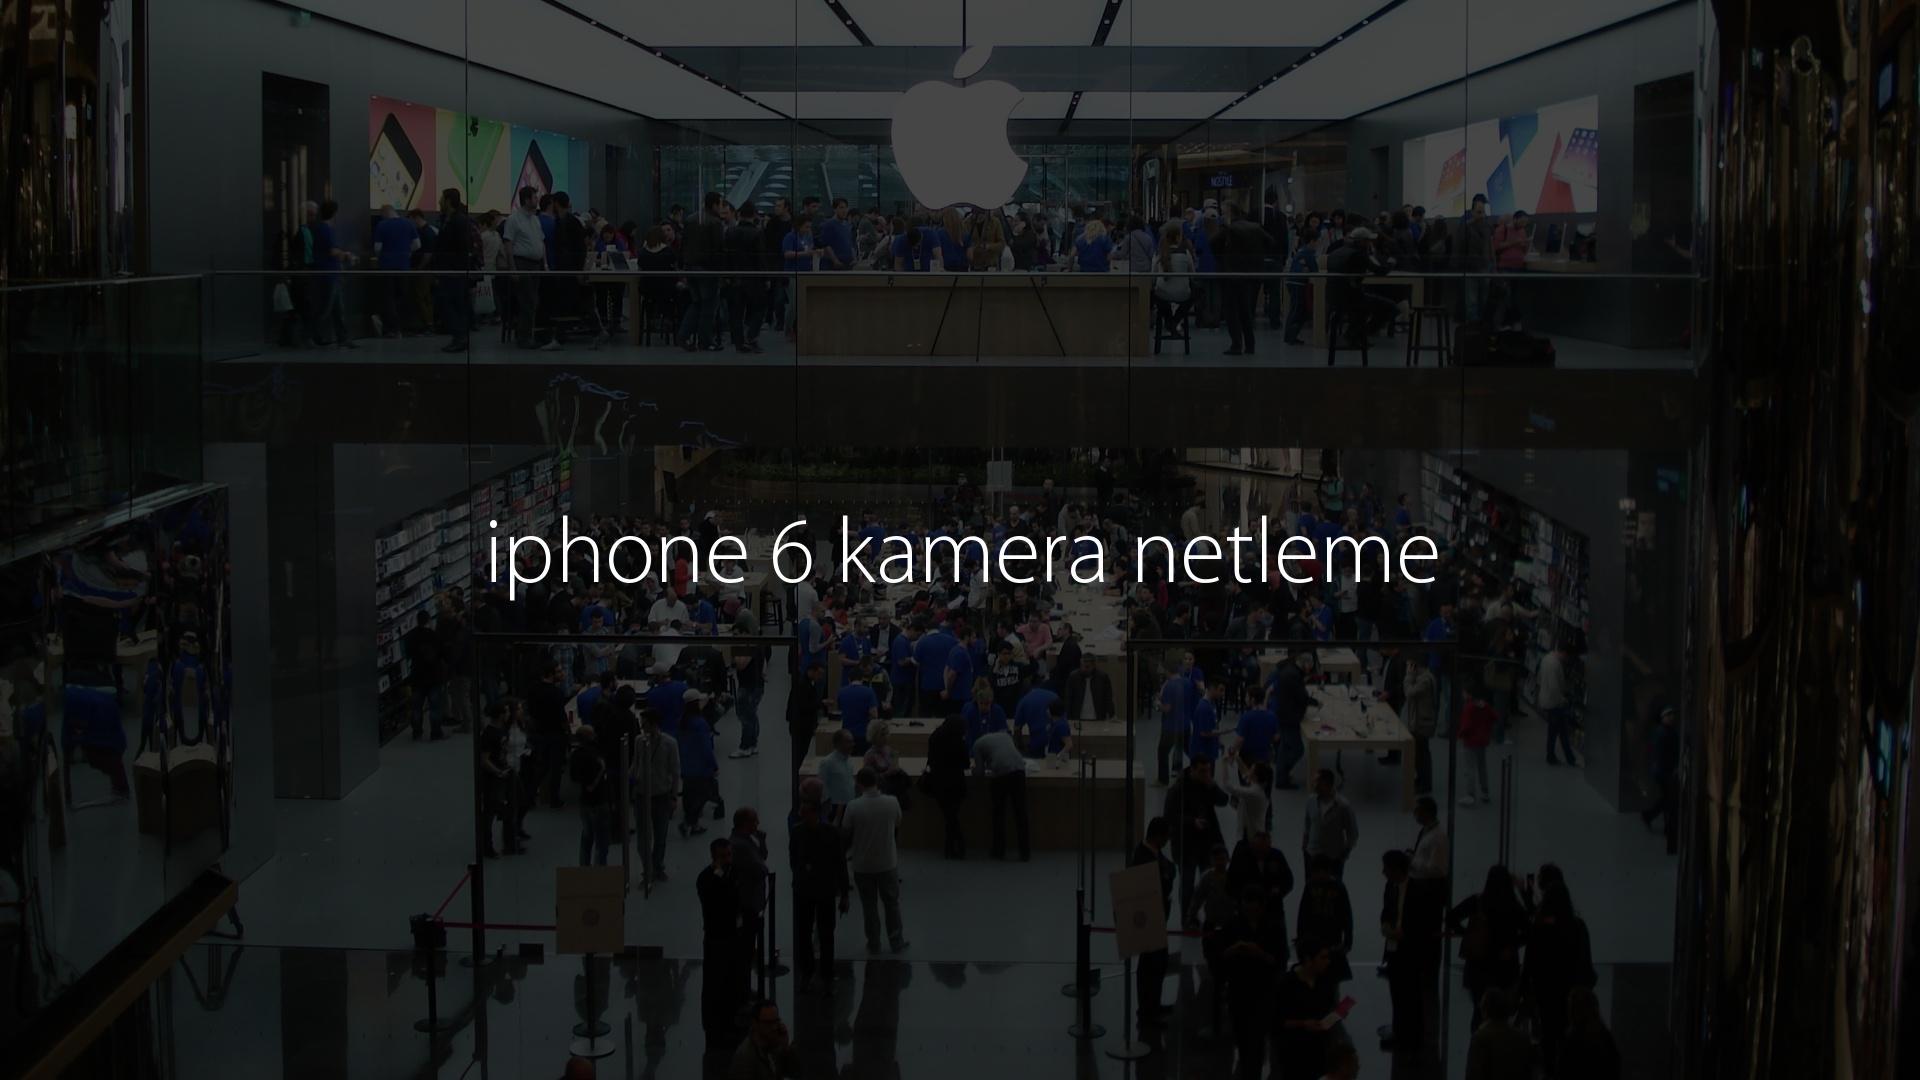 iphone 6 kamera netleme